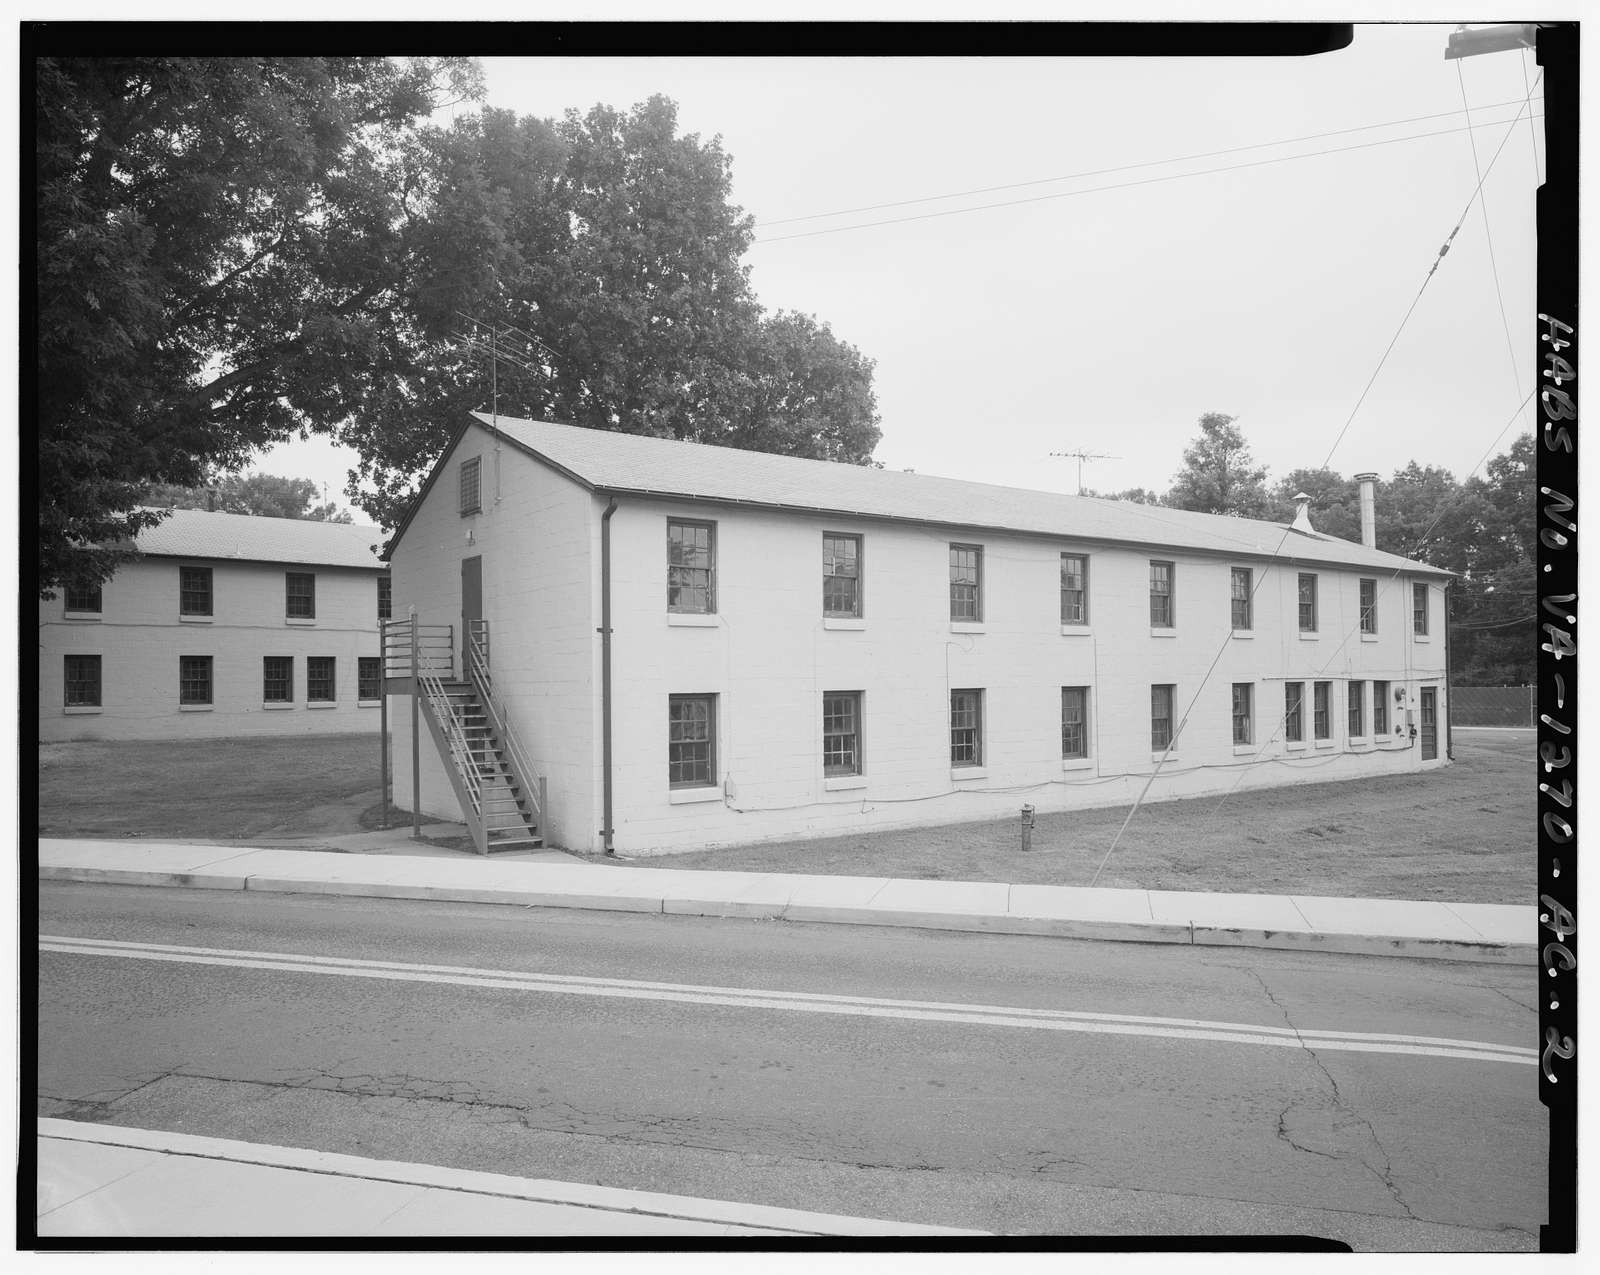 Arlington Hall Station, Building No. 504, 4000 Arlington Boulevard, Arlington, Arlington County, VA